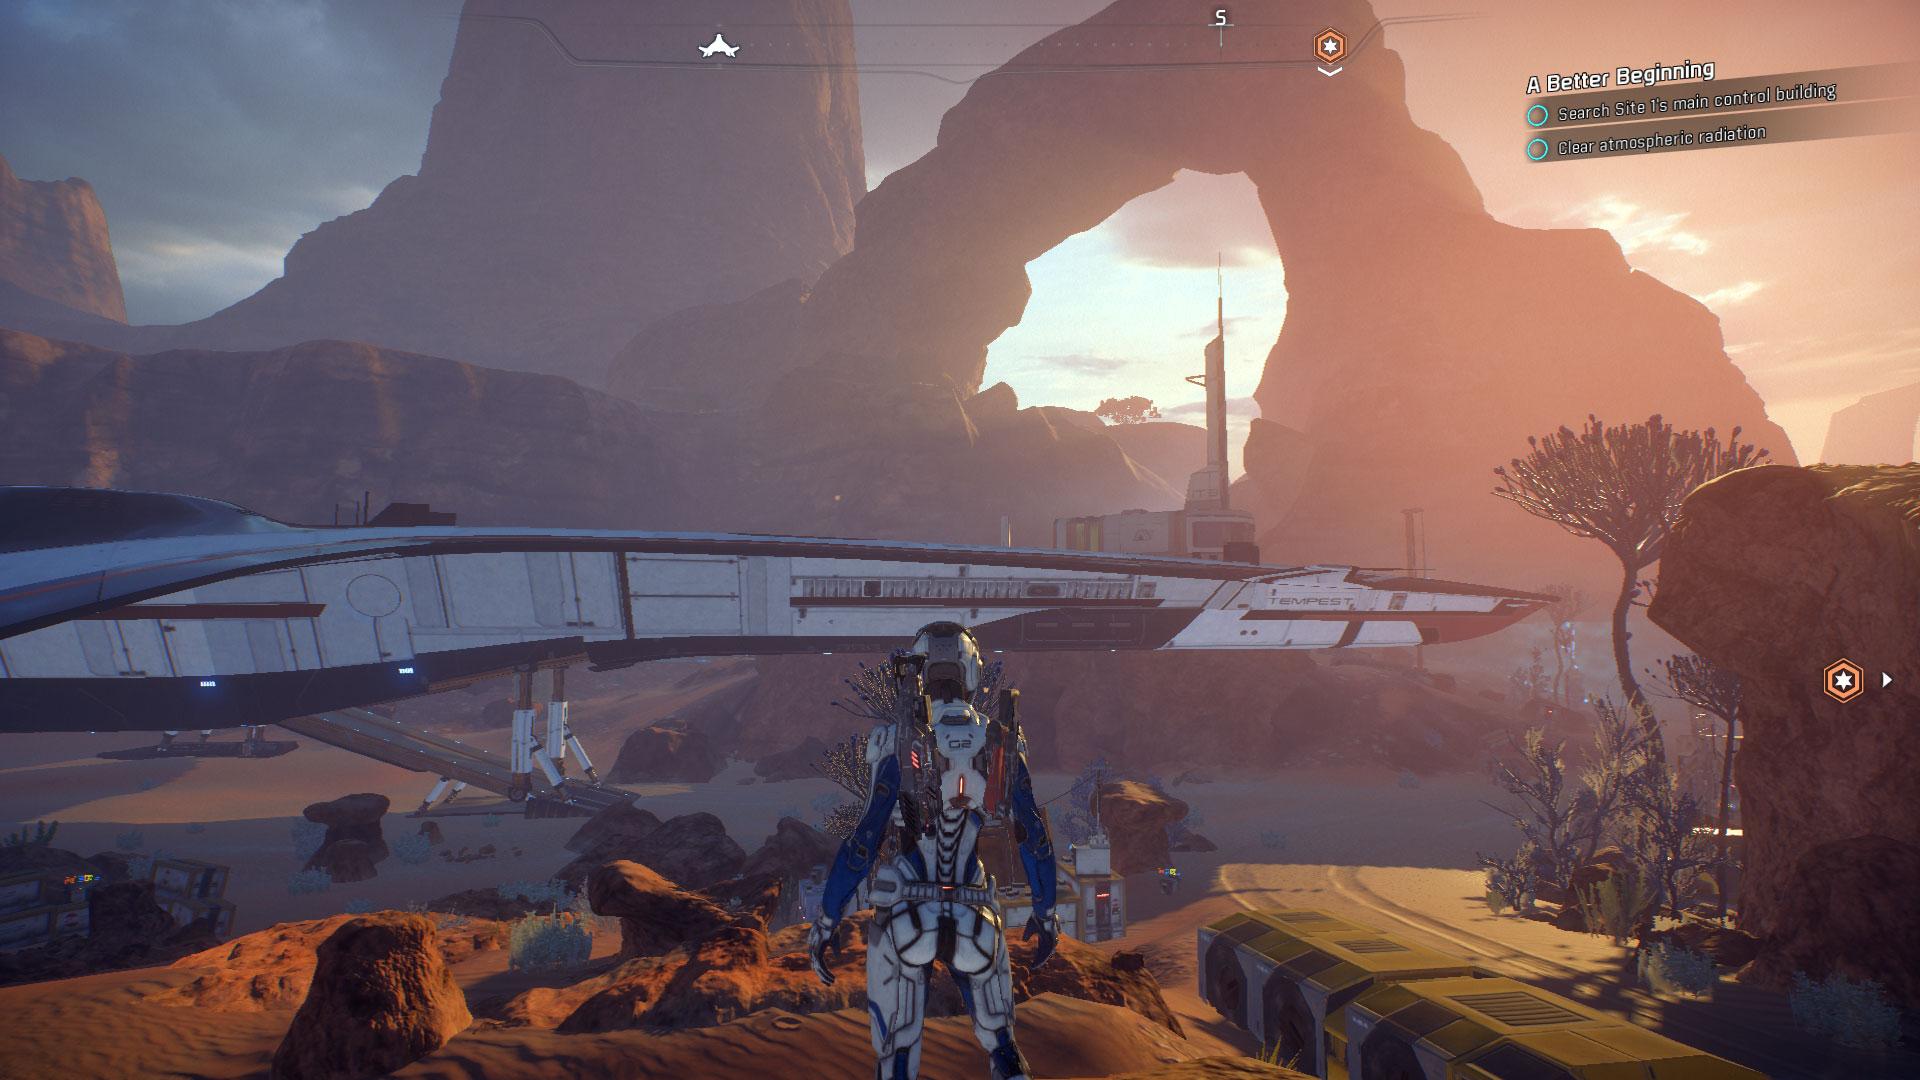 Mass Effect Andromeda Pc Performance Analysis Pc Gamer